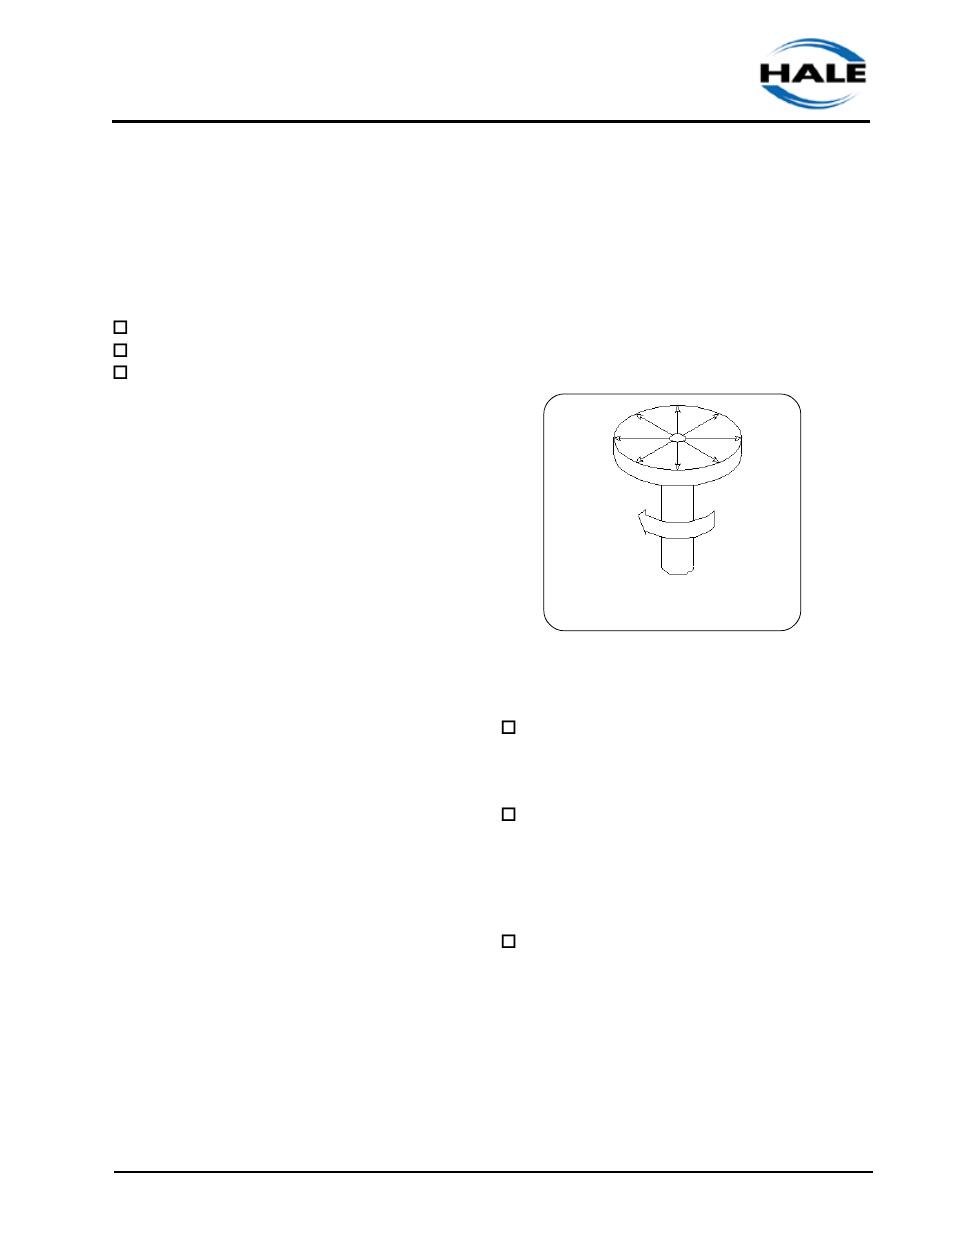 Hale 2CBP User Manual | Page 5 / 70 | Also for: CBP, AP